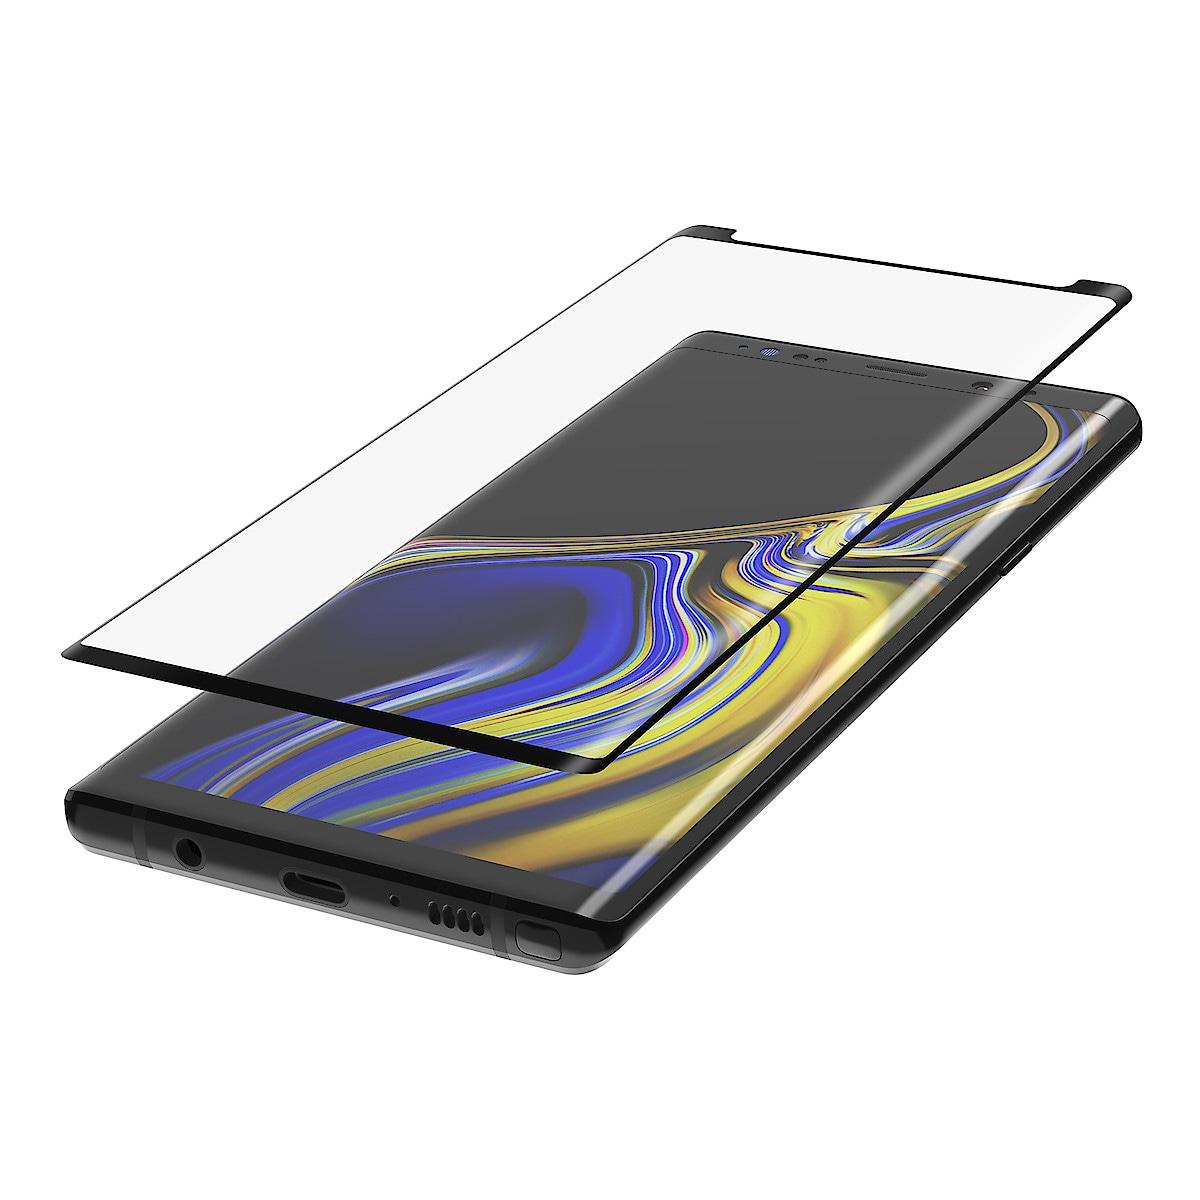 Displayschutz Samsung Galaxy Note 9, Belkin Screenforce TemperedCurve